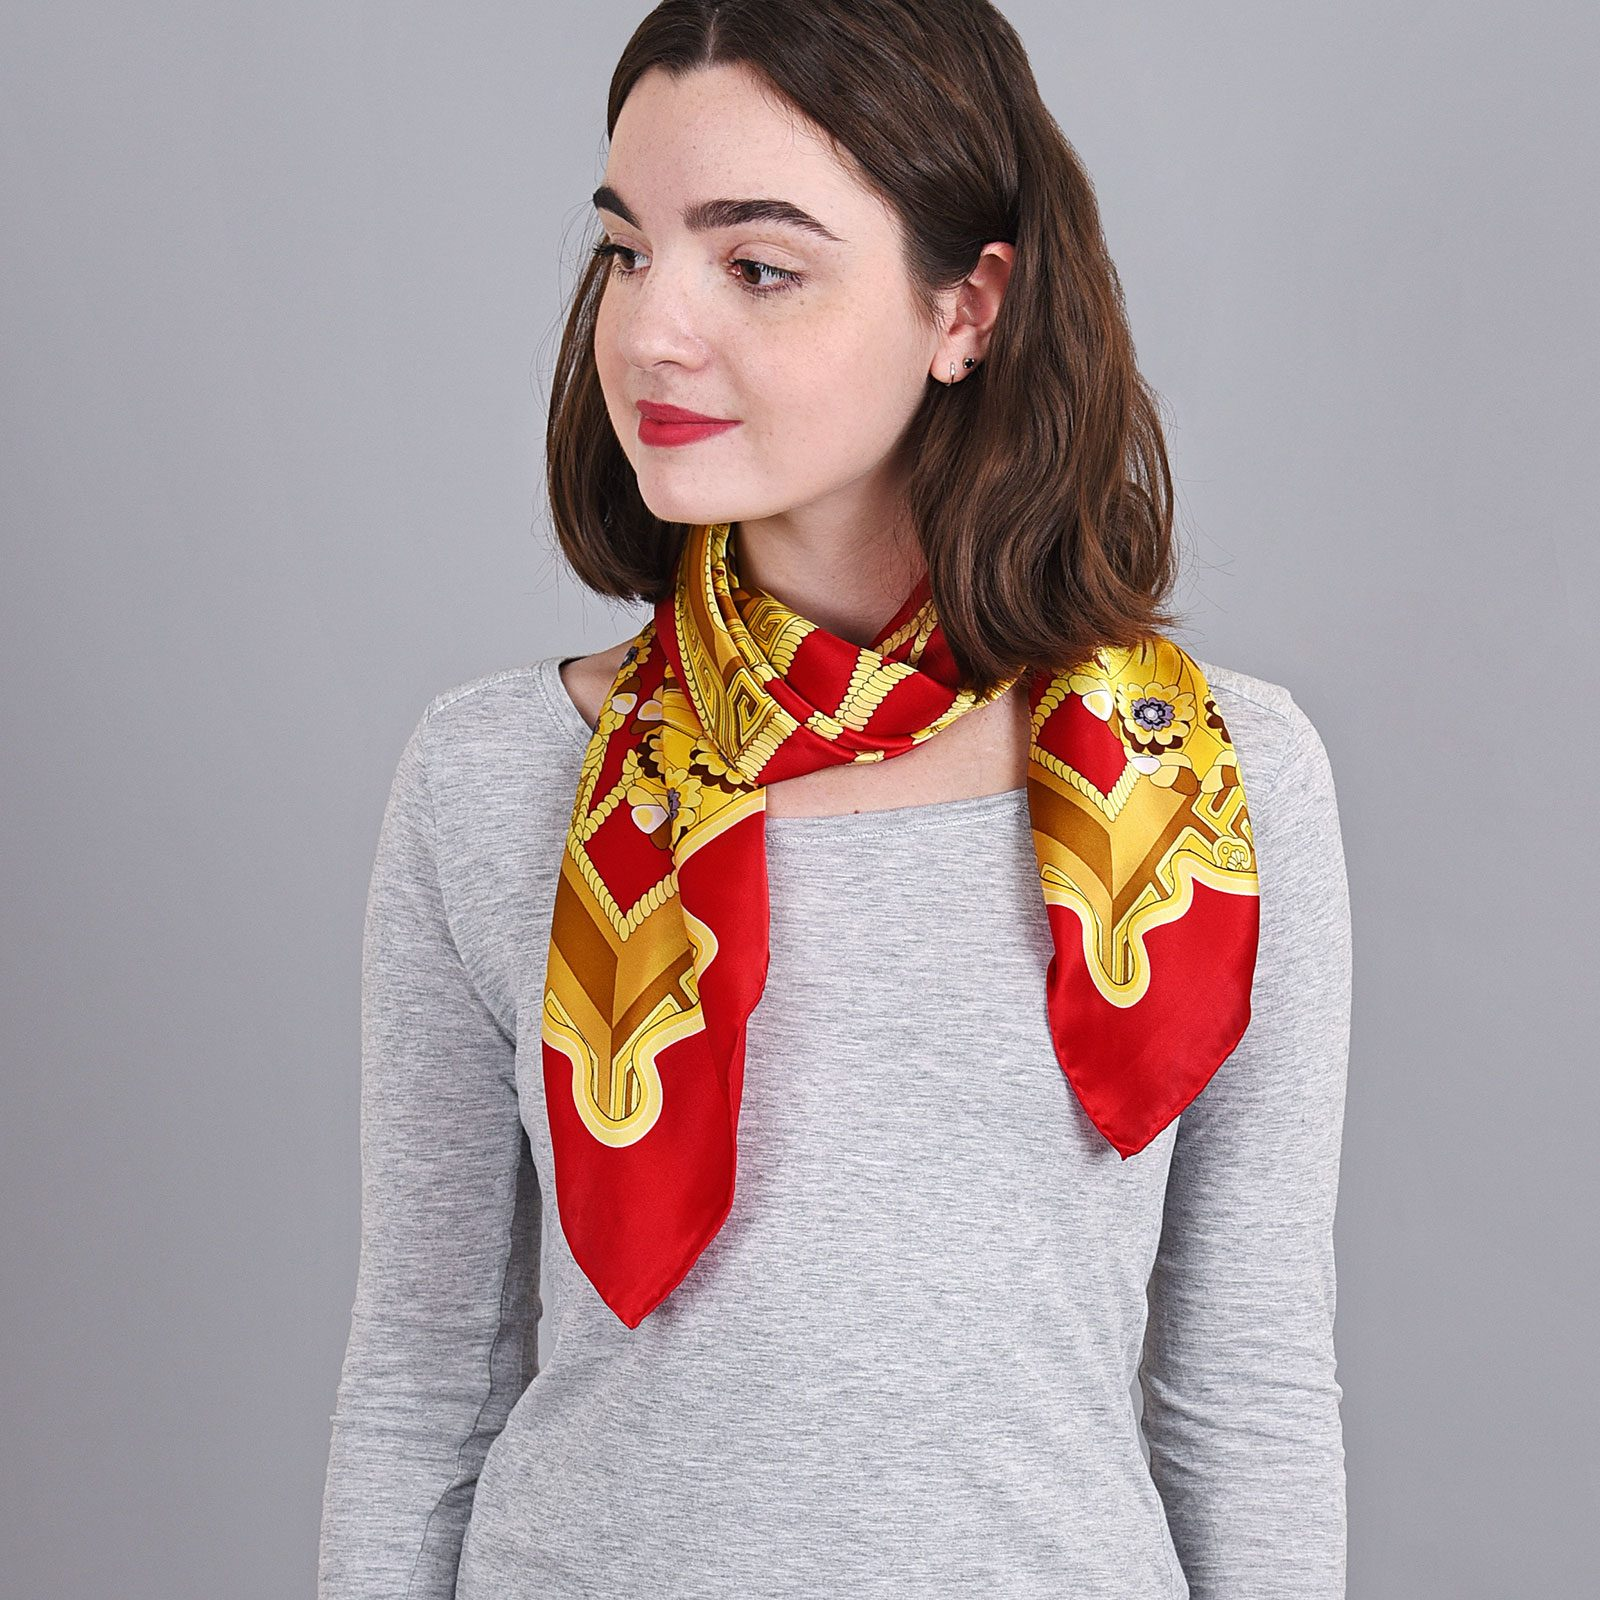 http://lookbook.allee-du-foulard.fr/wp-content/uploads/2018/11/AT-04053-VF16-carre-soie-rouge-jaune-1-1600x1600.jpg